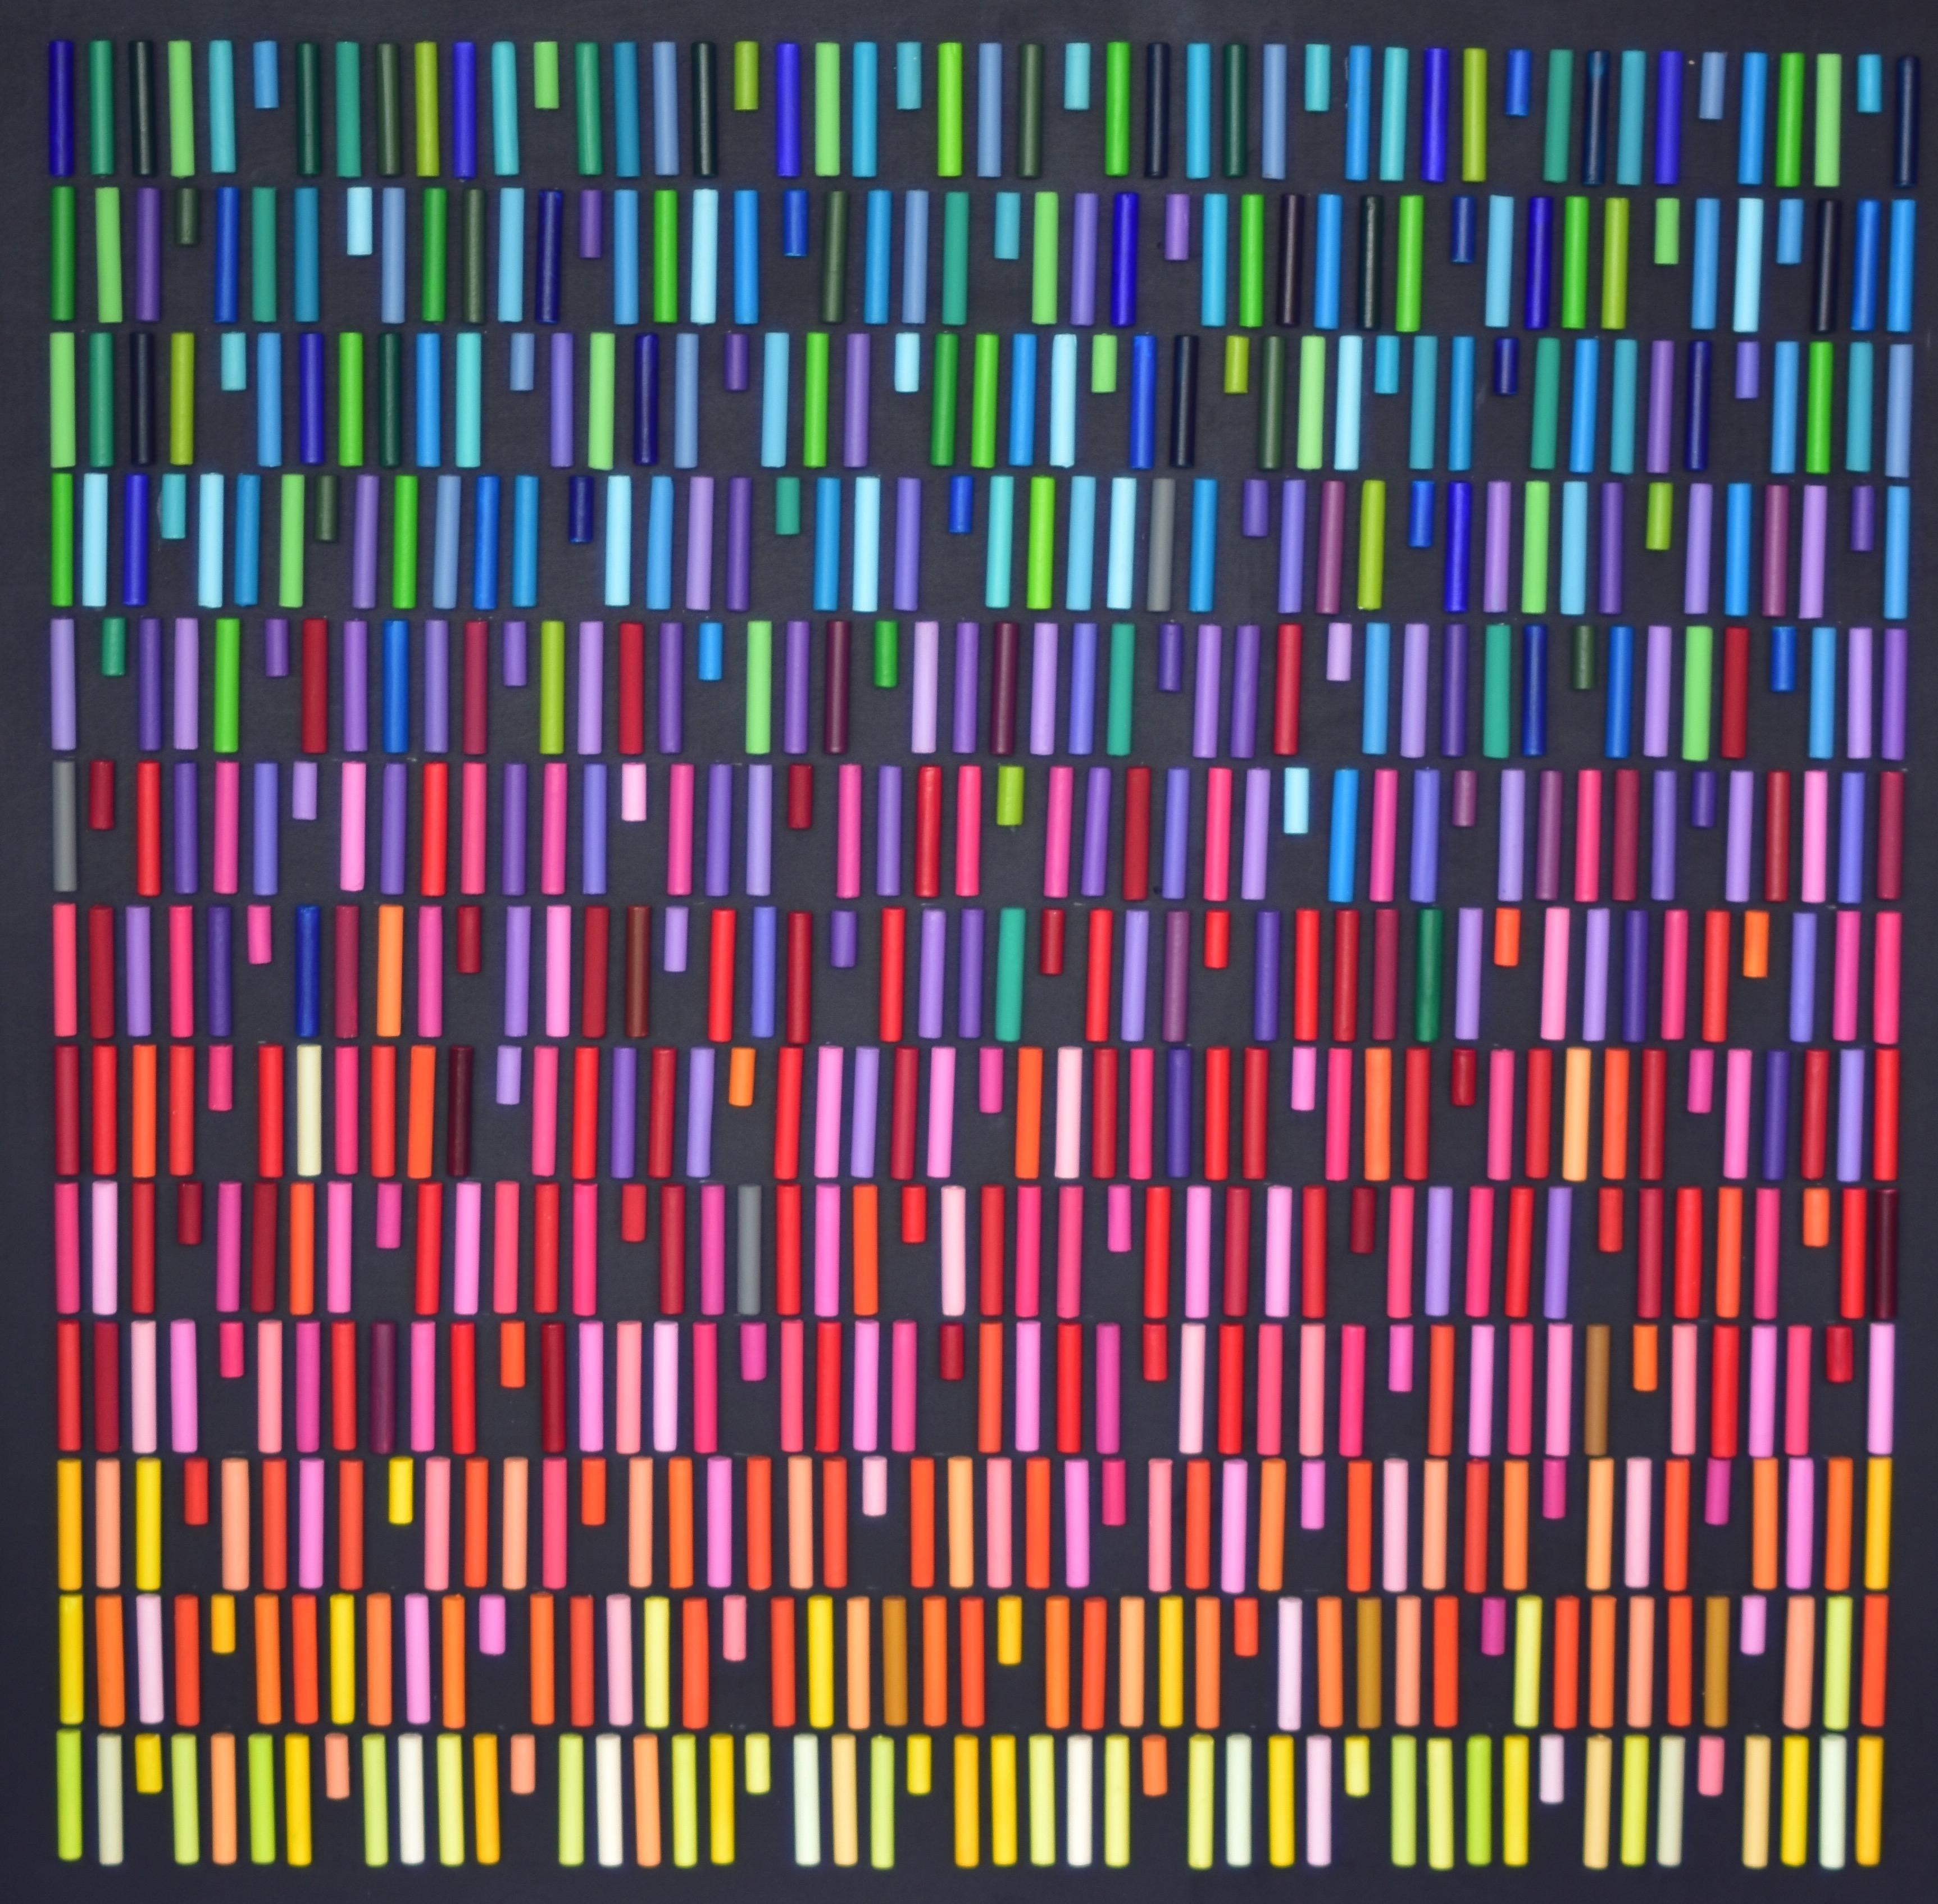 Allegro Barbaro Painting with Plastic Technique, Erika Baktay